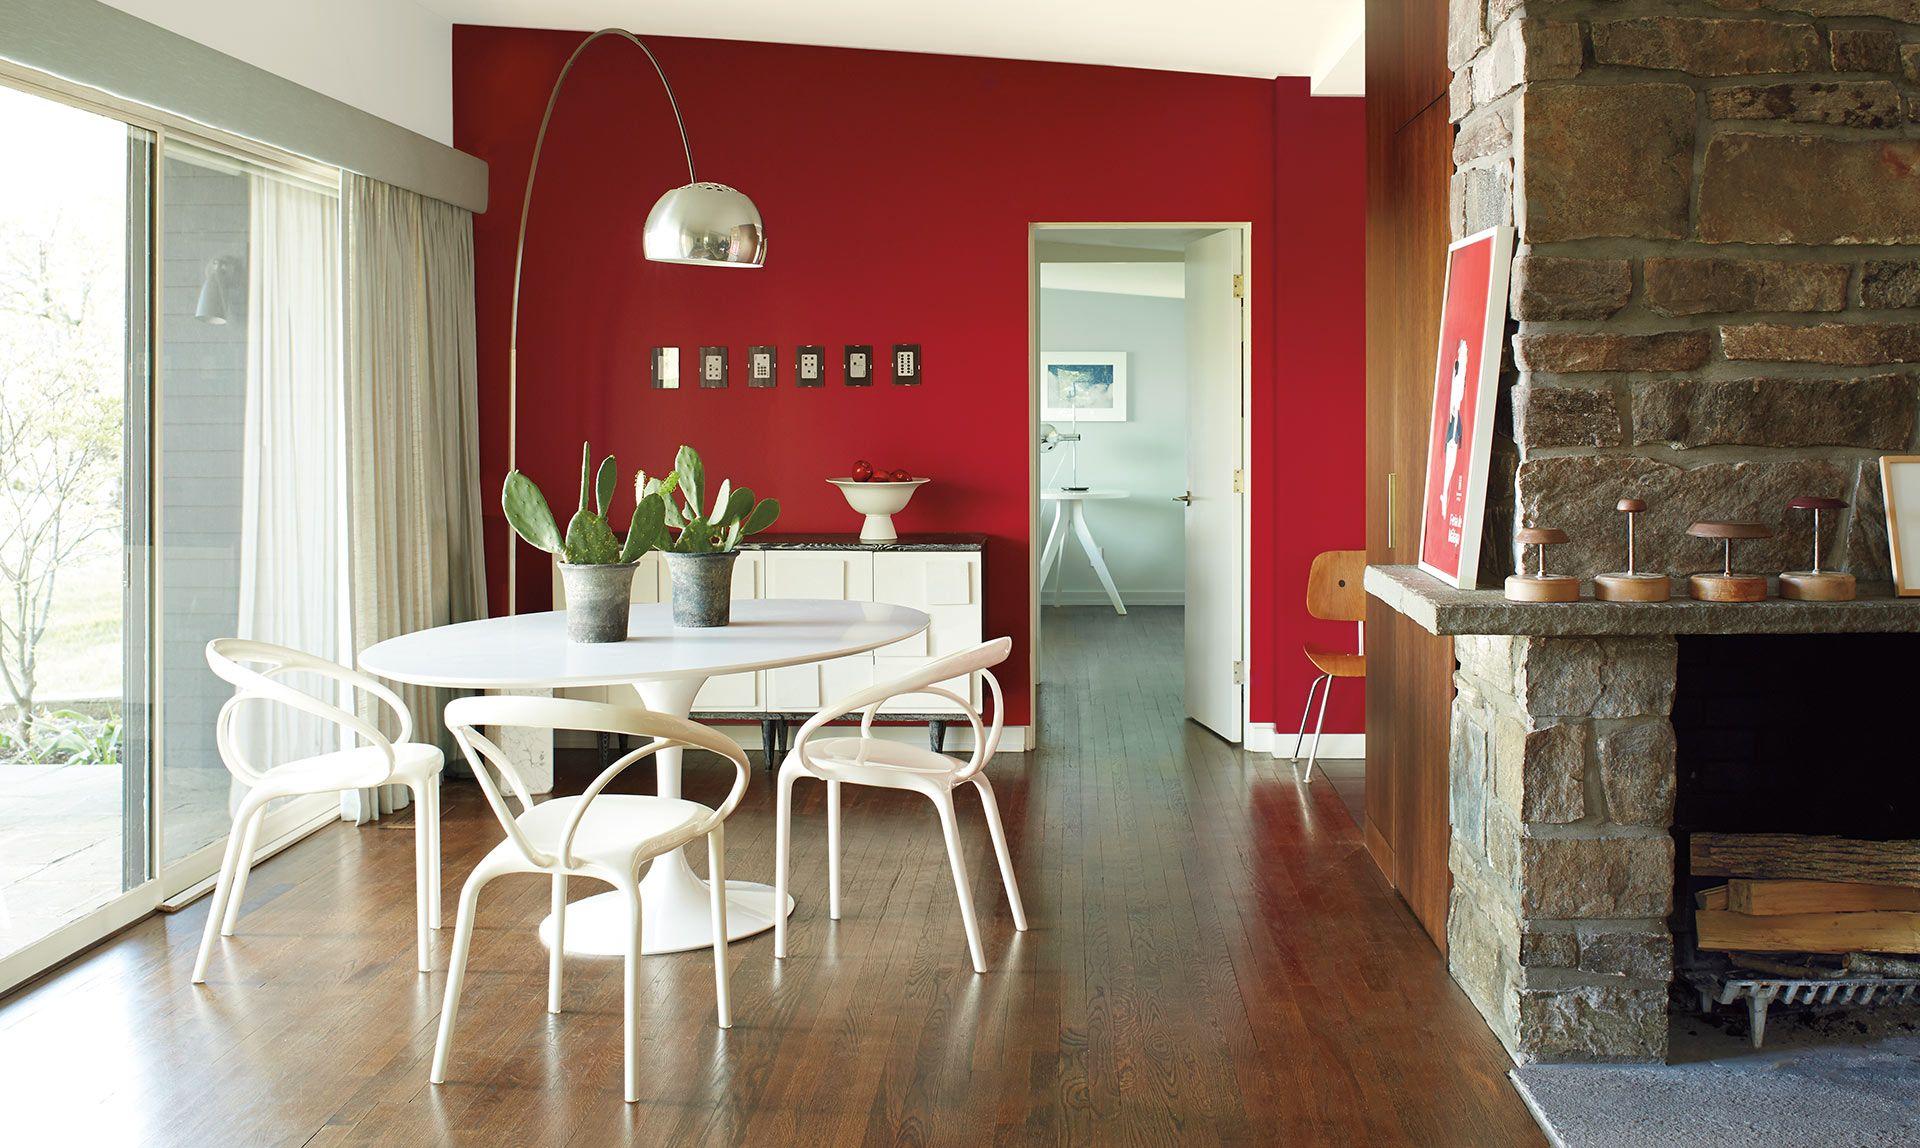 2018 Color Trends - Caliente AF-290   Colour for the Home   Pinterest